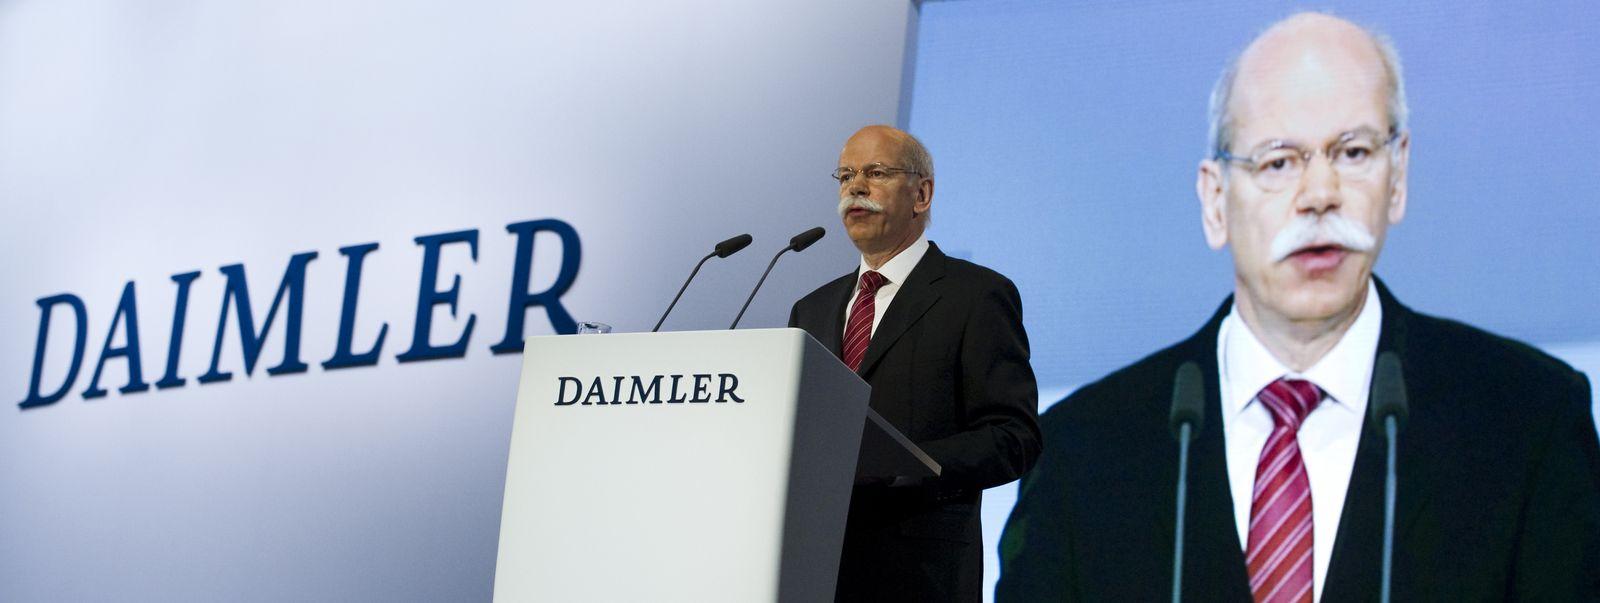 Daimler Zetsche